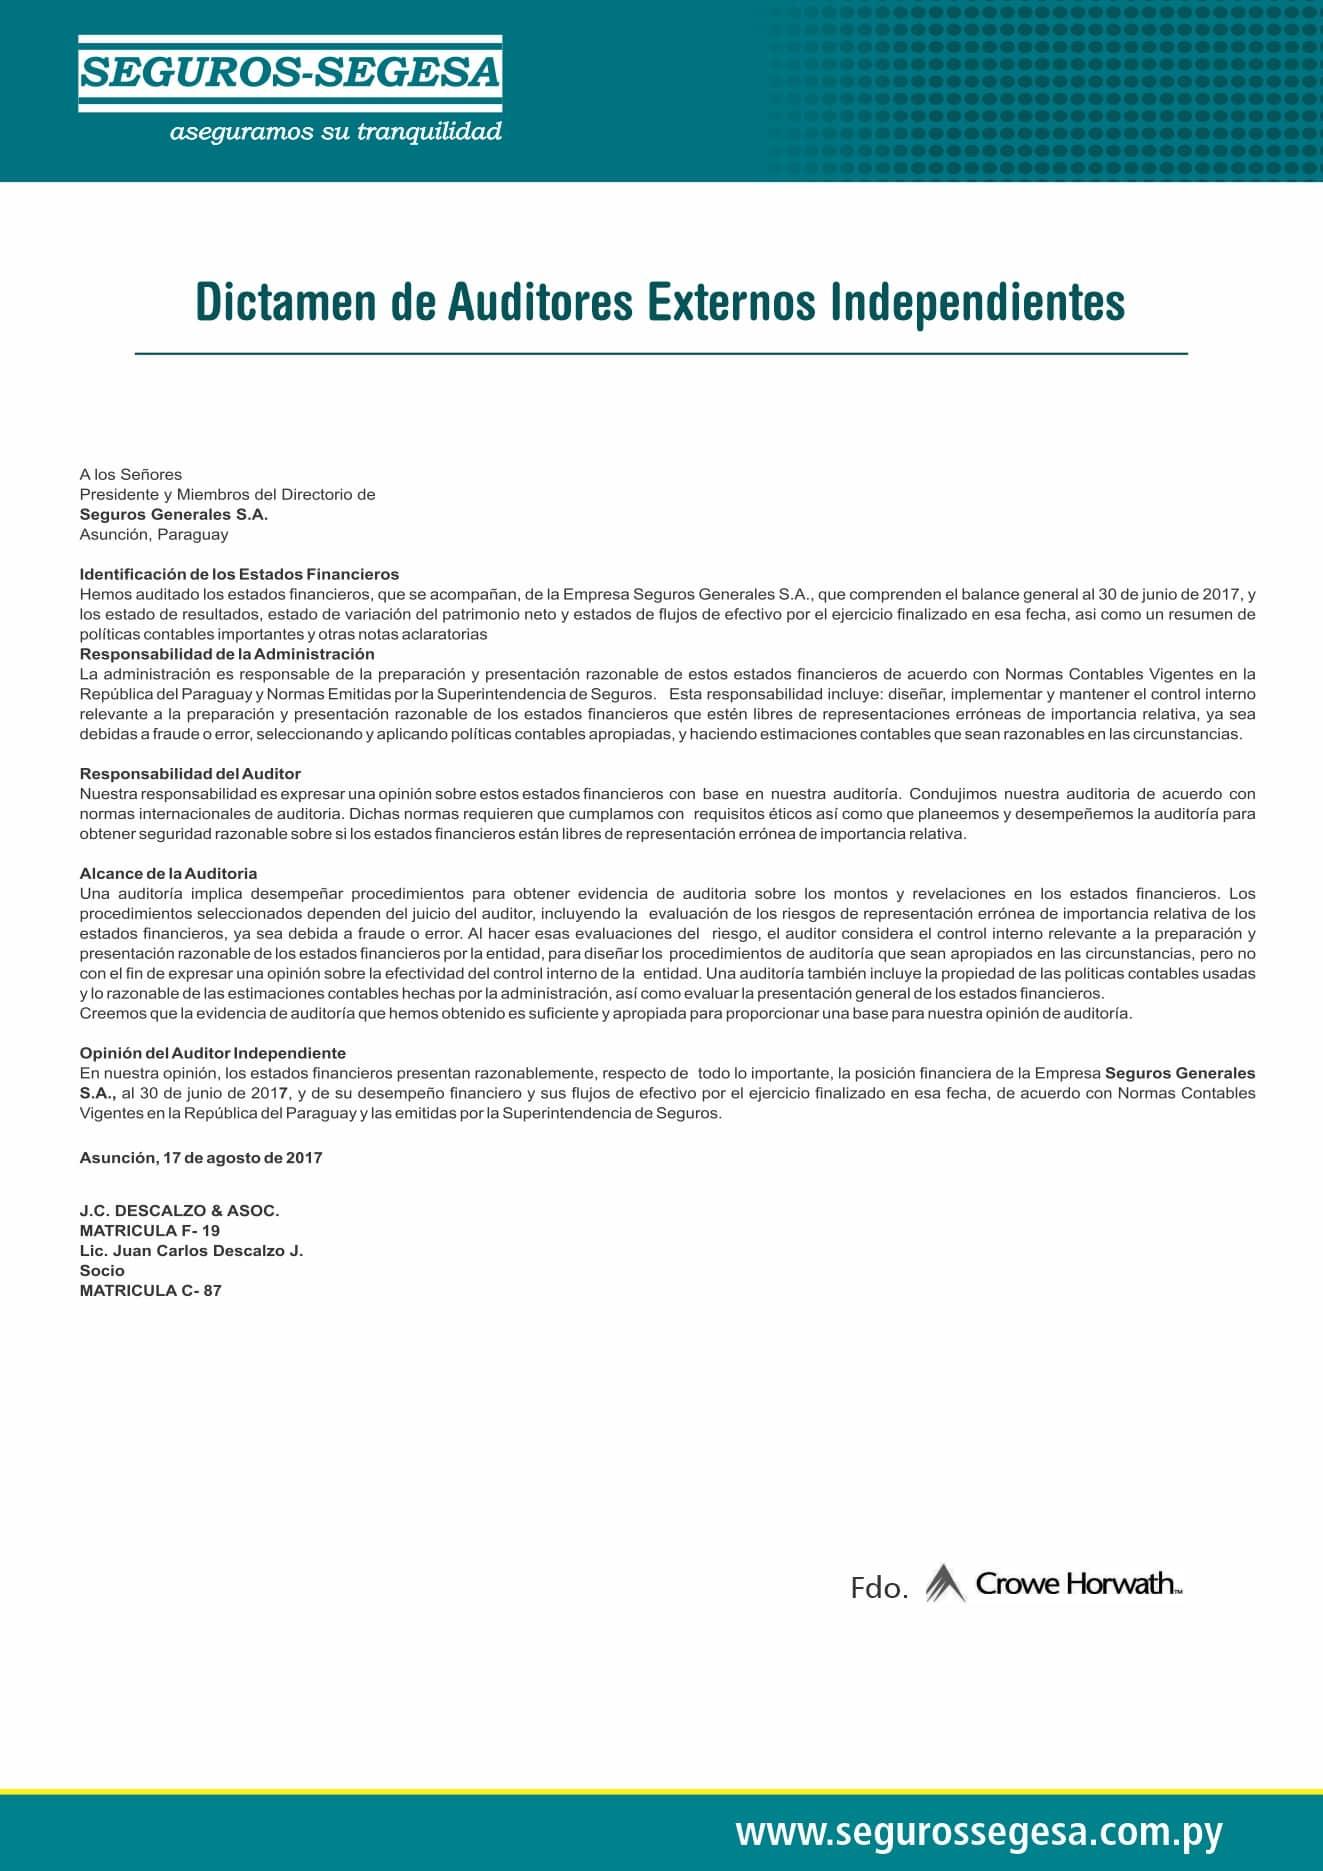 dictamen de auditores 2017